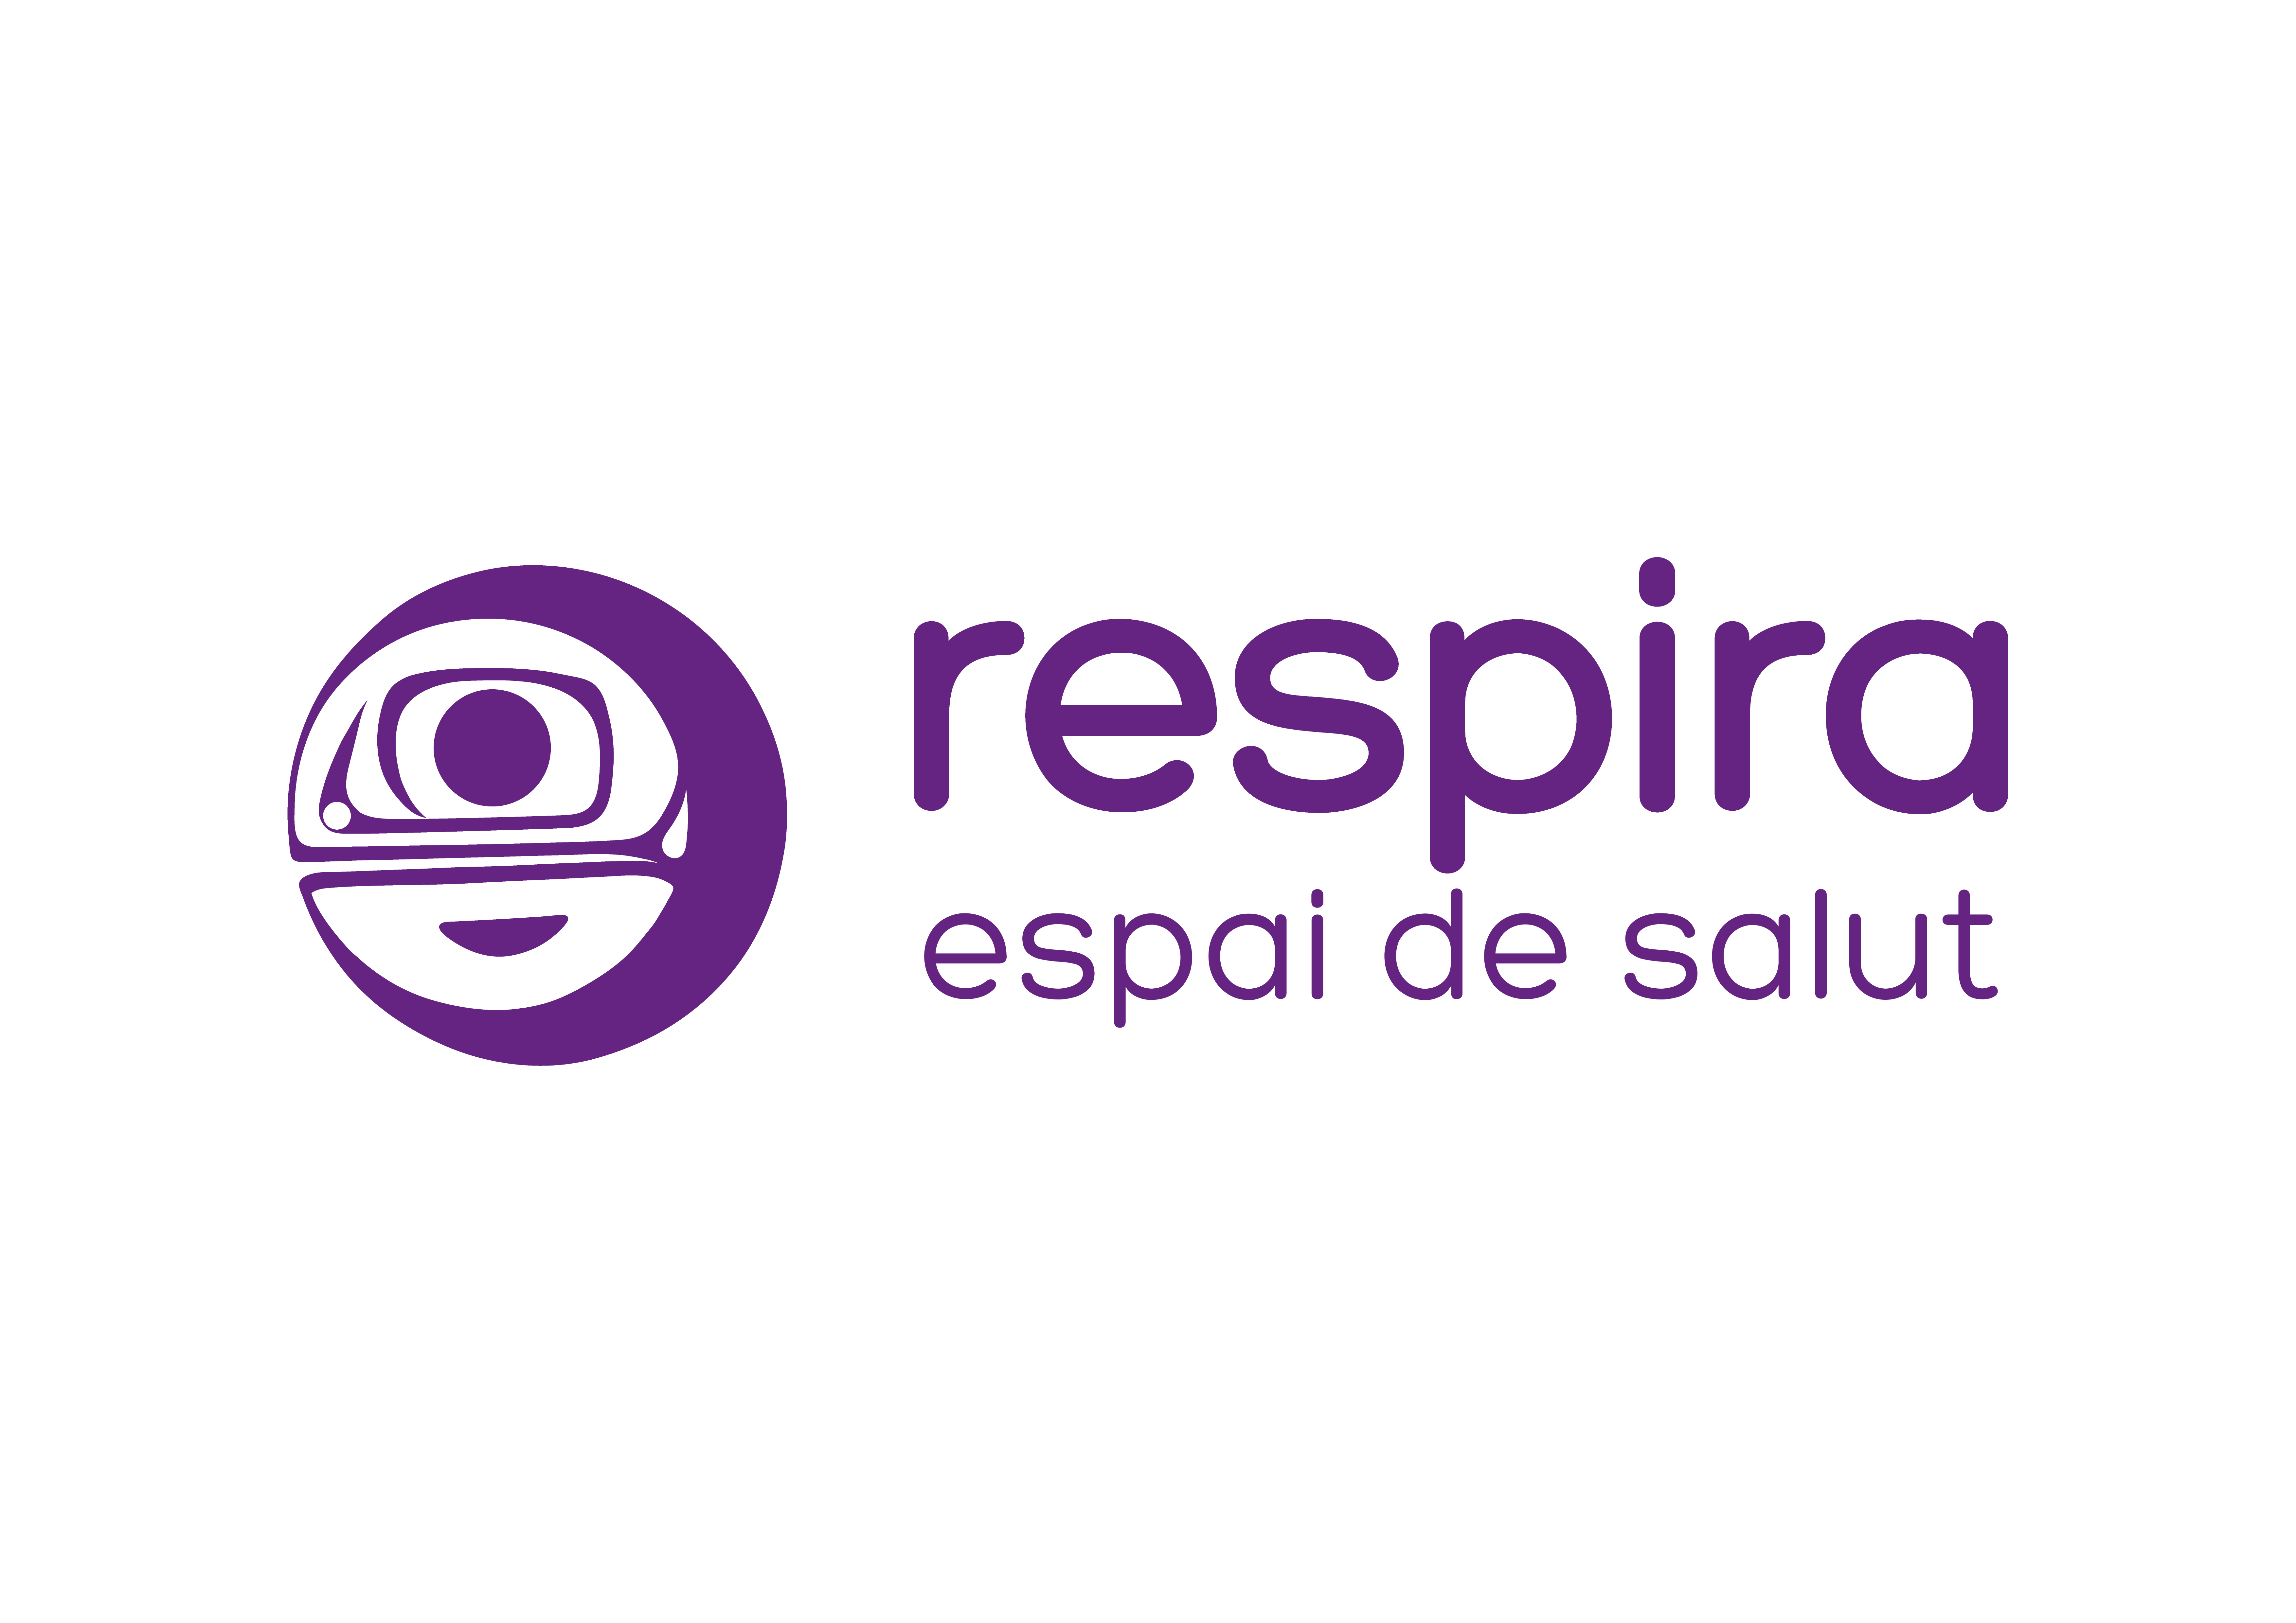 RESPIRA ESPAI DE SALUT